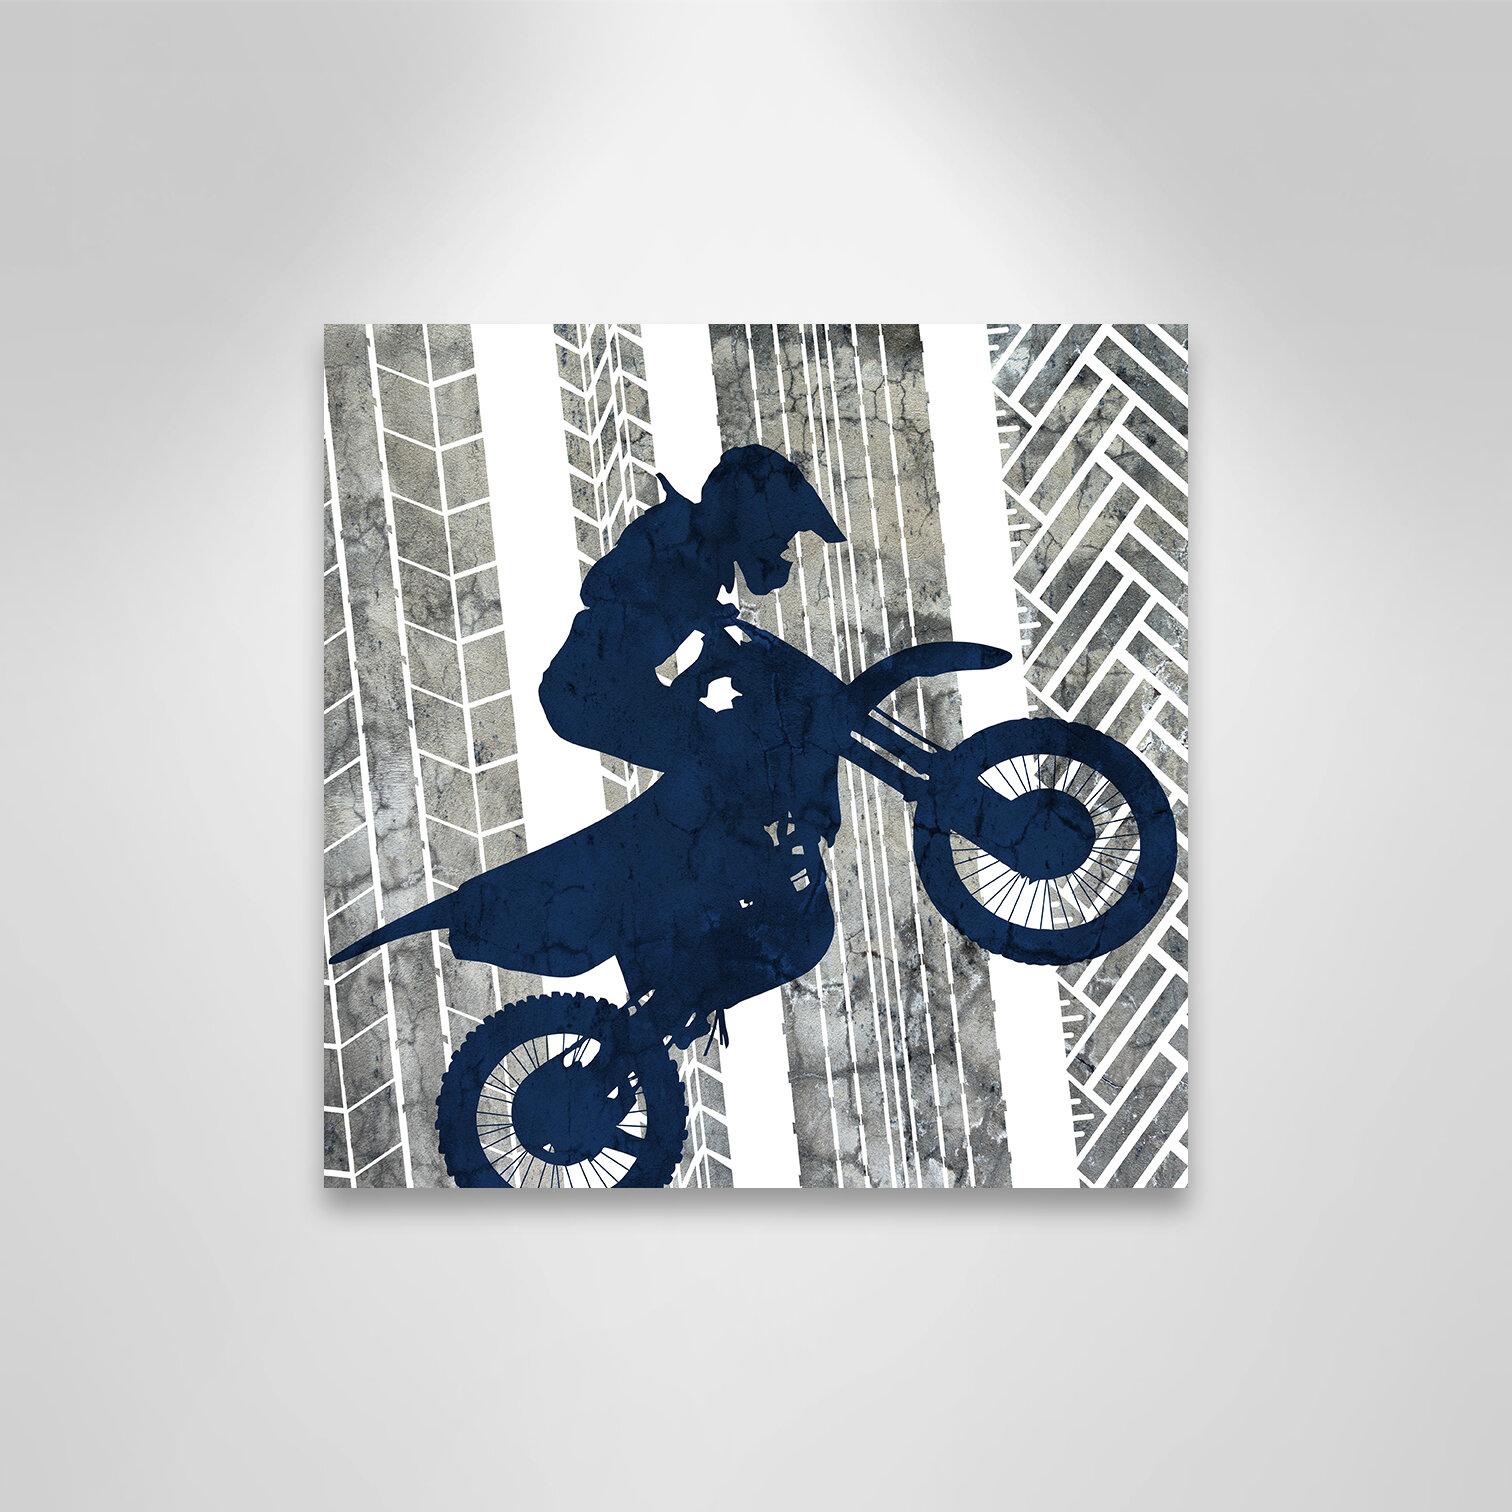 Casafinearts Juvenile Motocross 1 Canvas Art Wayfair